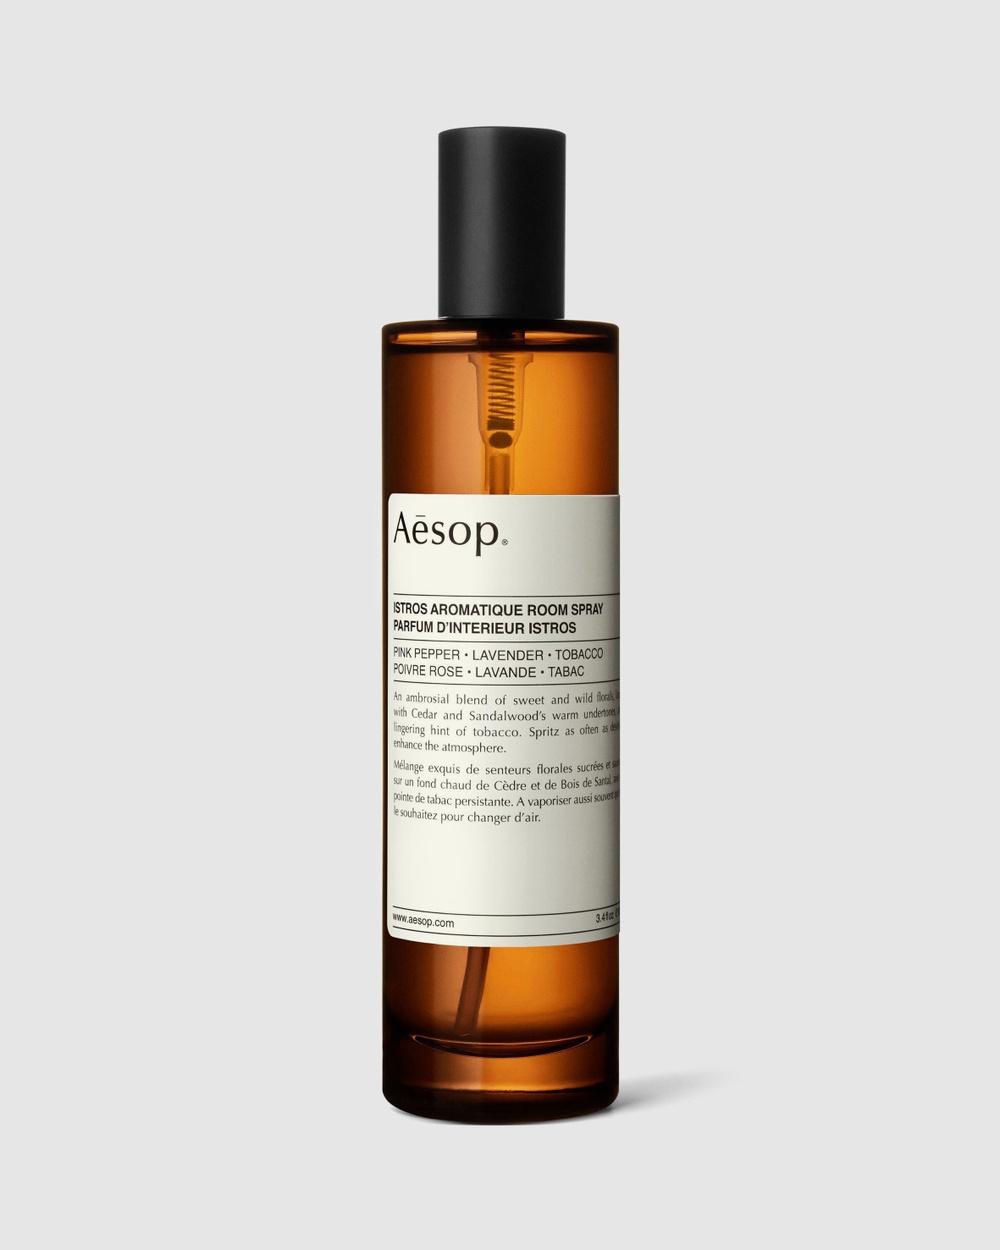 Aesop Istros Aromatique Room Spray 100mL Home Fragrance N/A